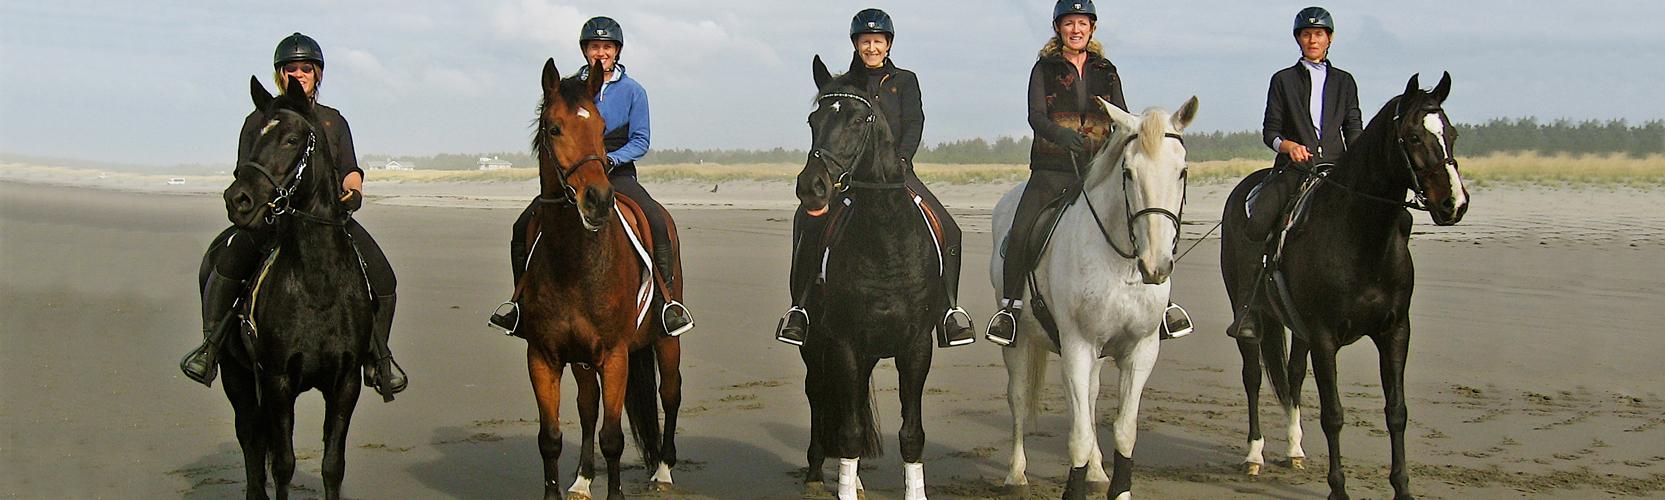 5 women on horses